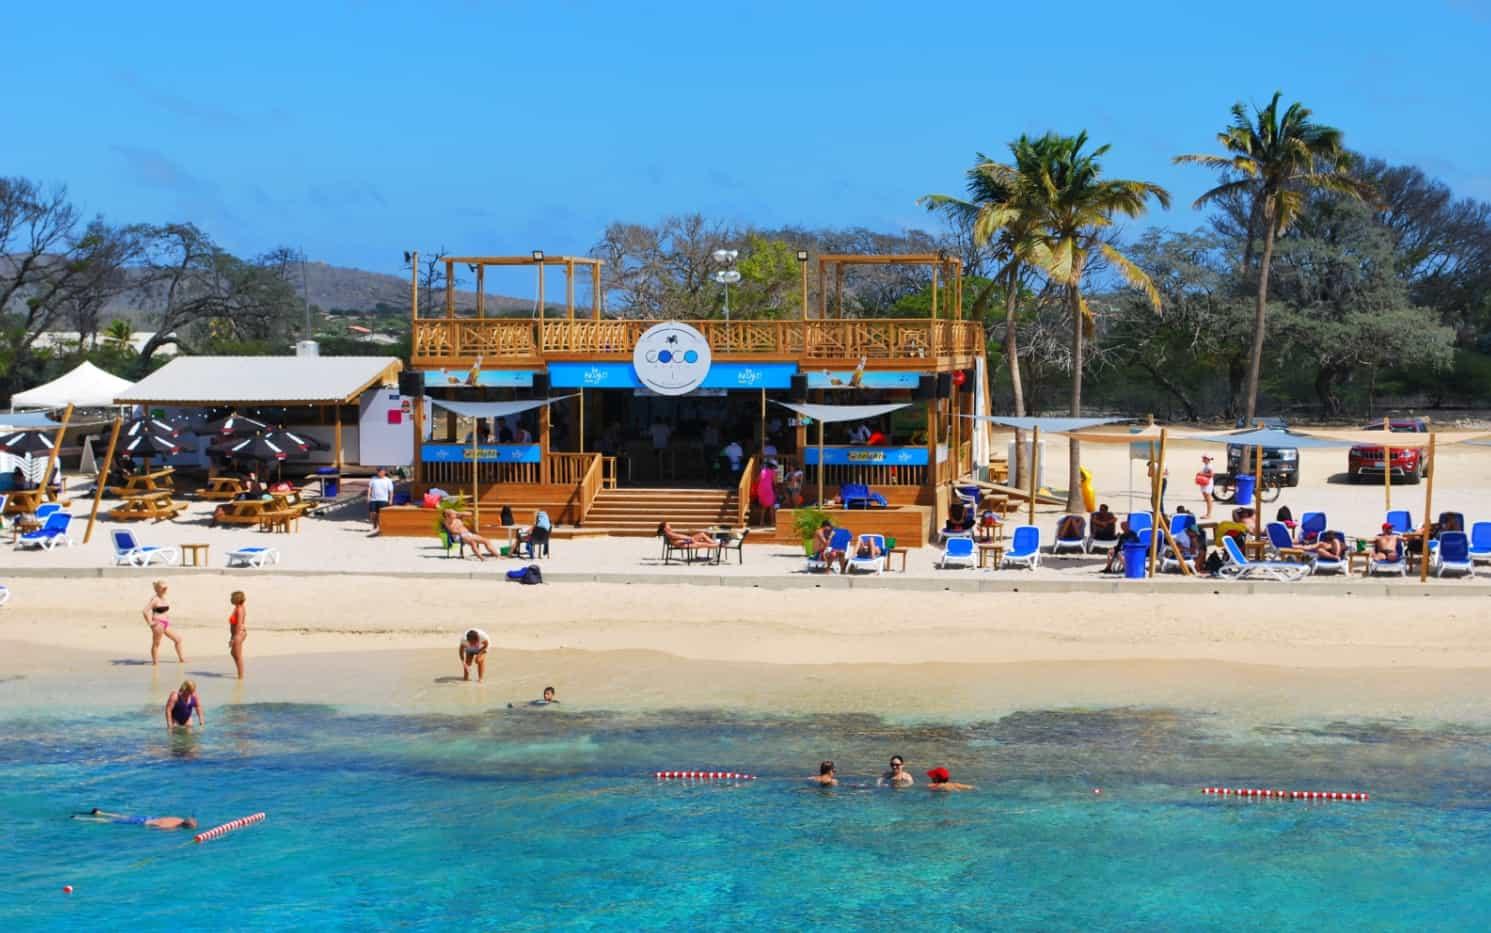 Một góc của Coco Beach, Phan Thiết